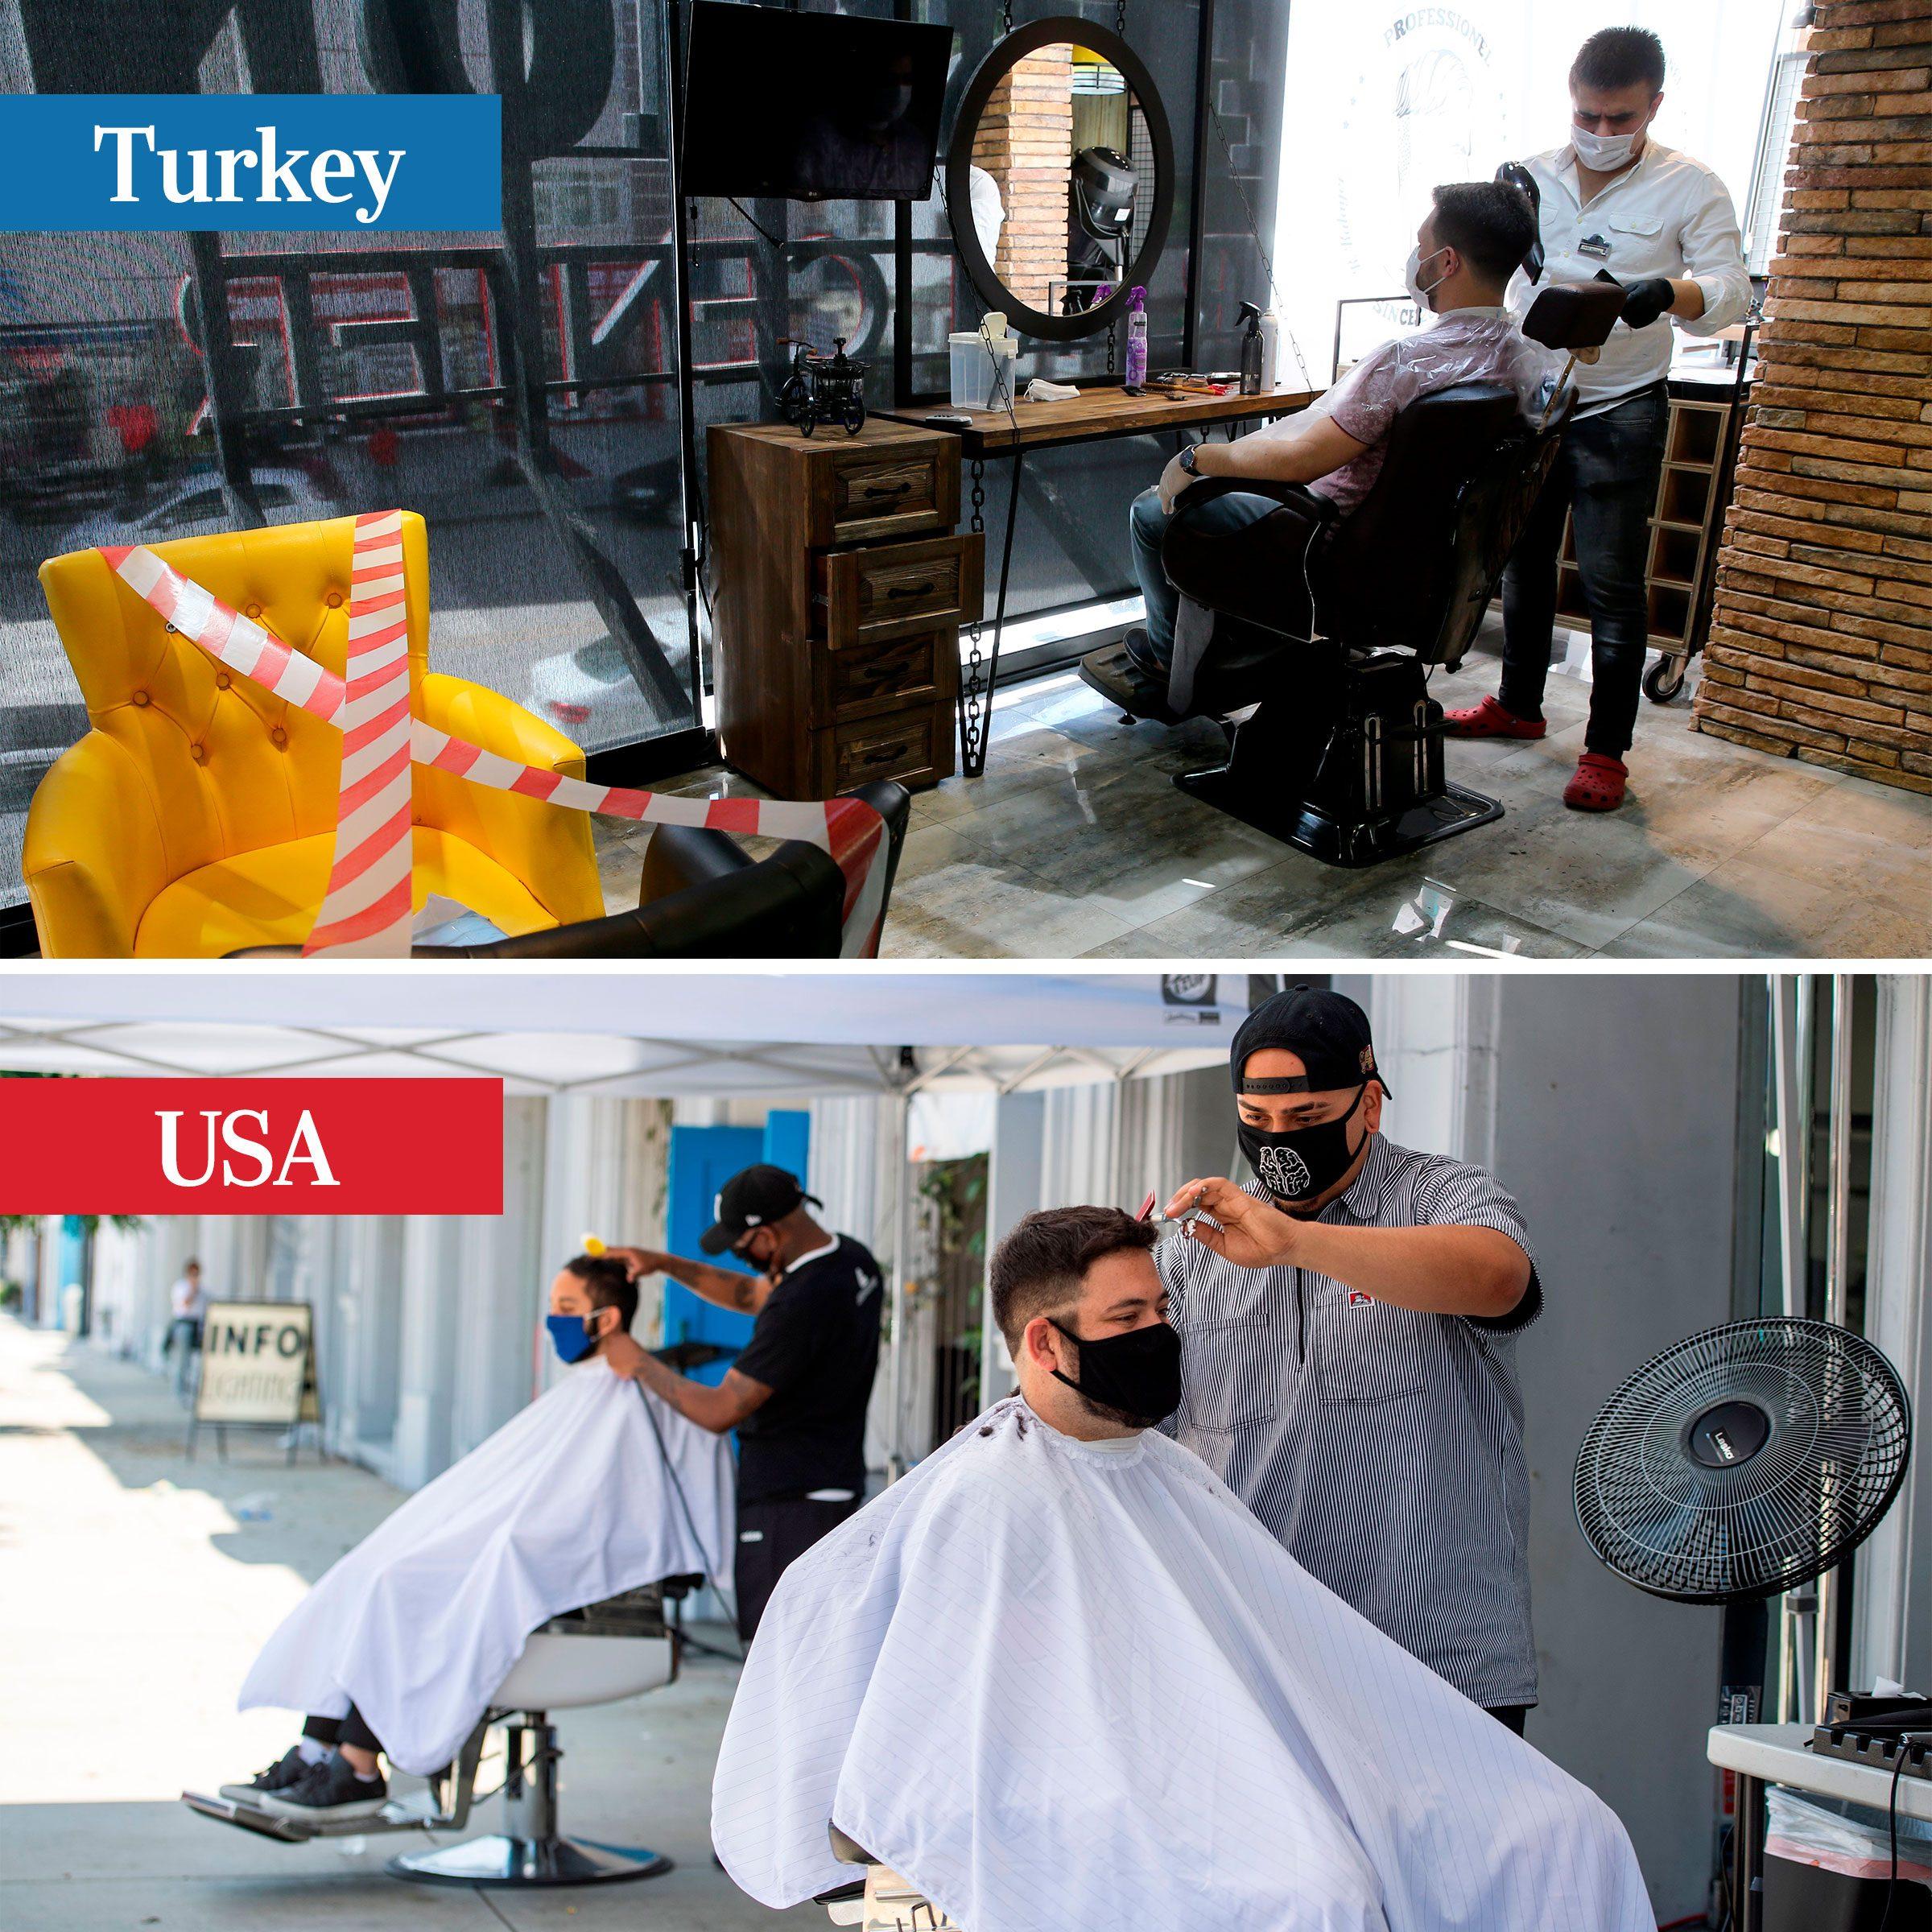 turkey vs usa - barbershops